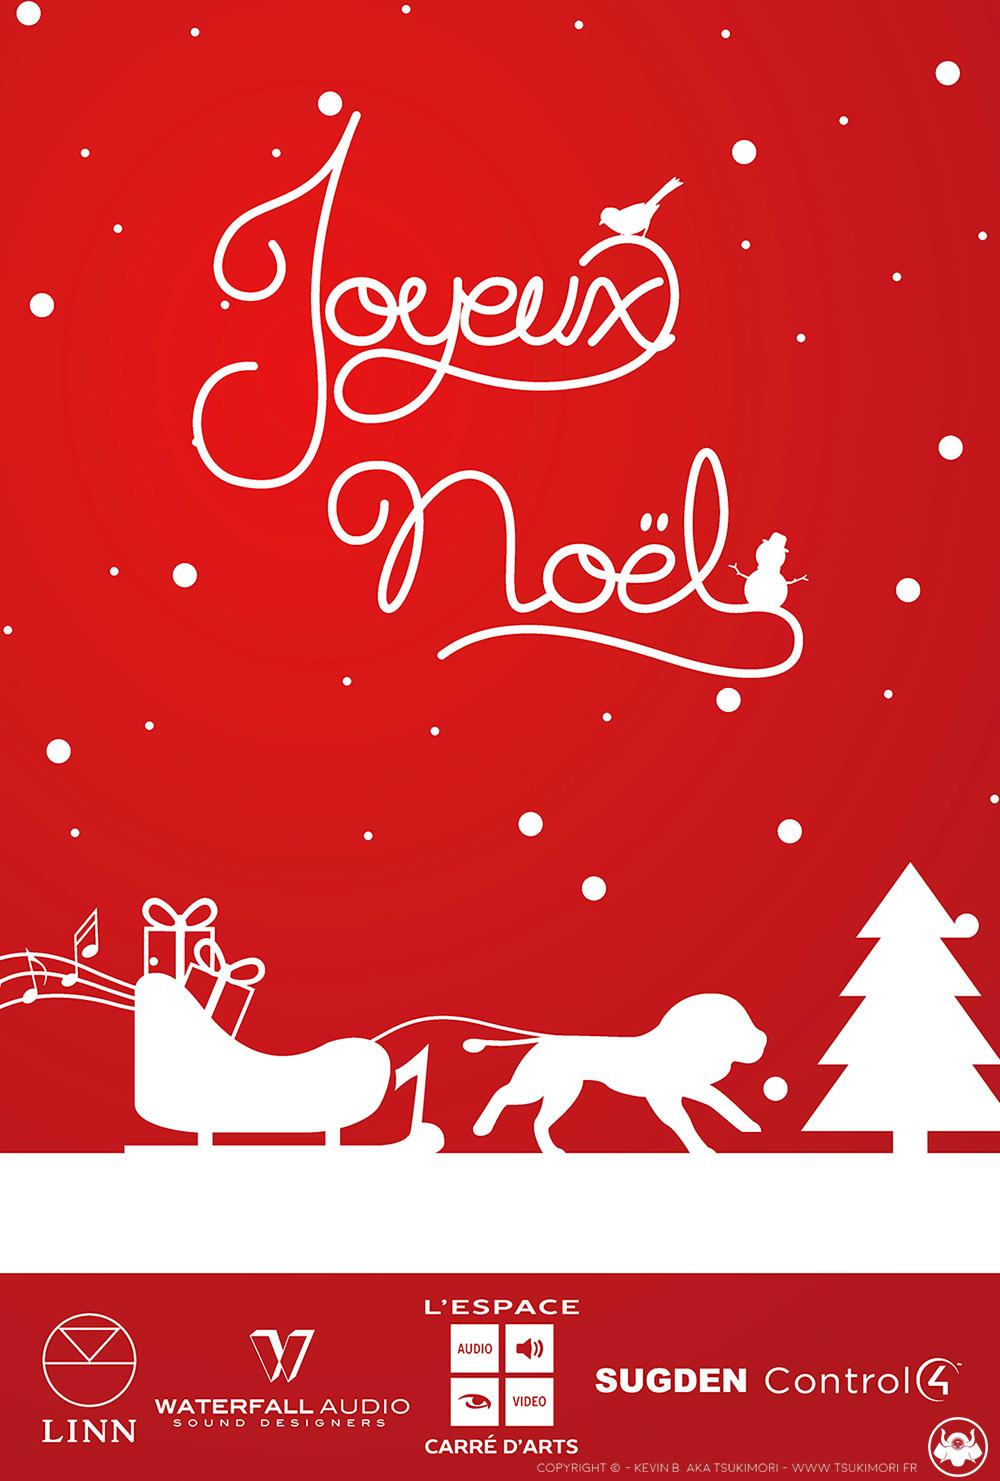 Joyeux Noel Audio.Joyeux Noel 2016 L Espace Carre D Arts Tsukimori Kevin